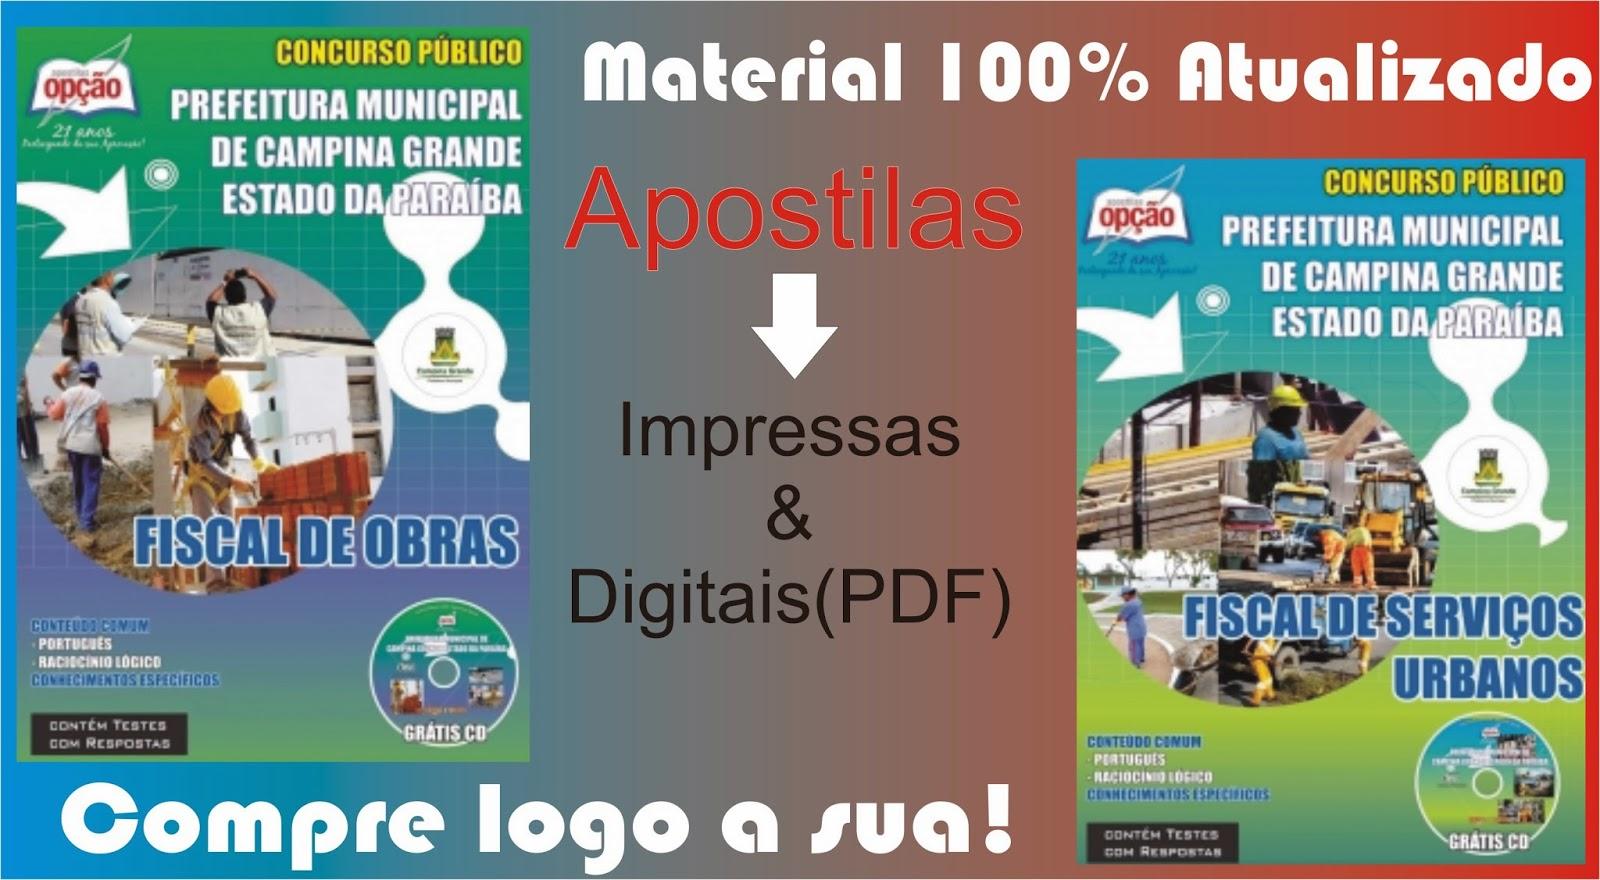 http://www.apostilasopcao.com.br/apostilas/1321/prefeitura-de-campina-grande-pb.php?afiliado=2561